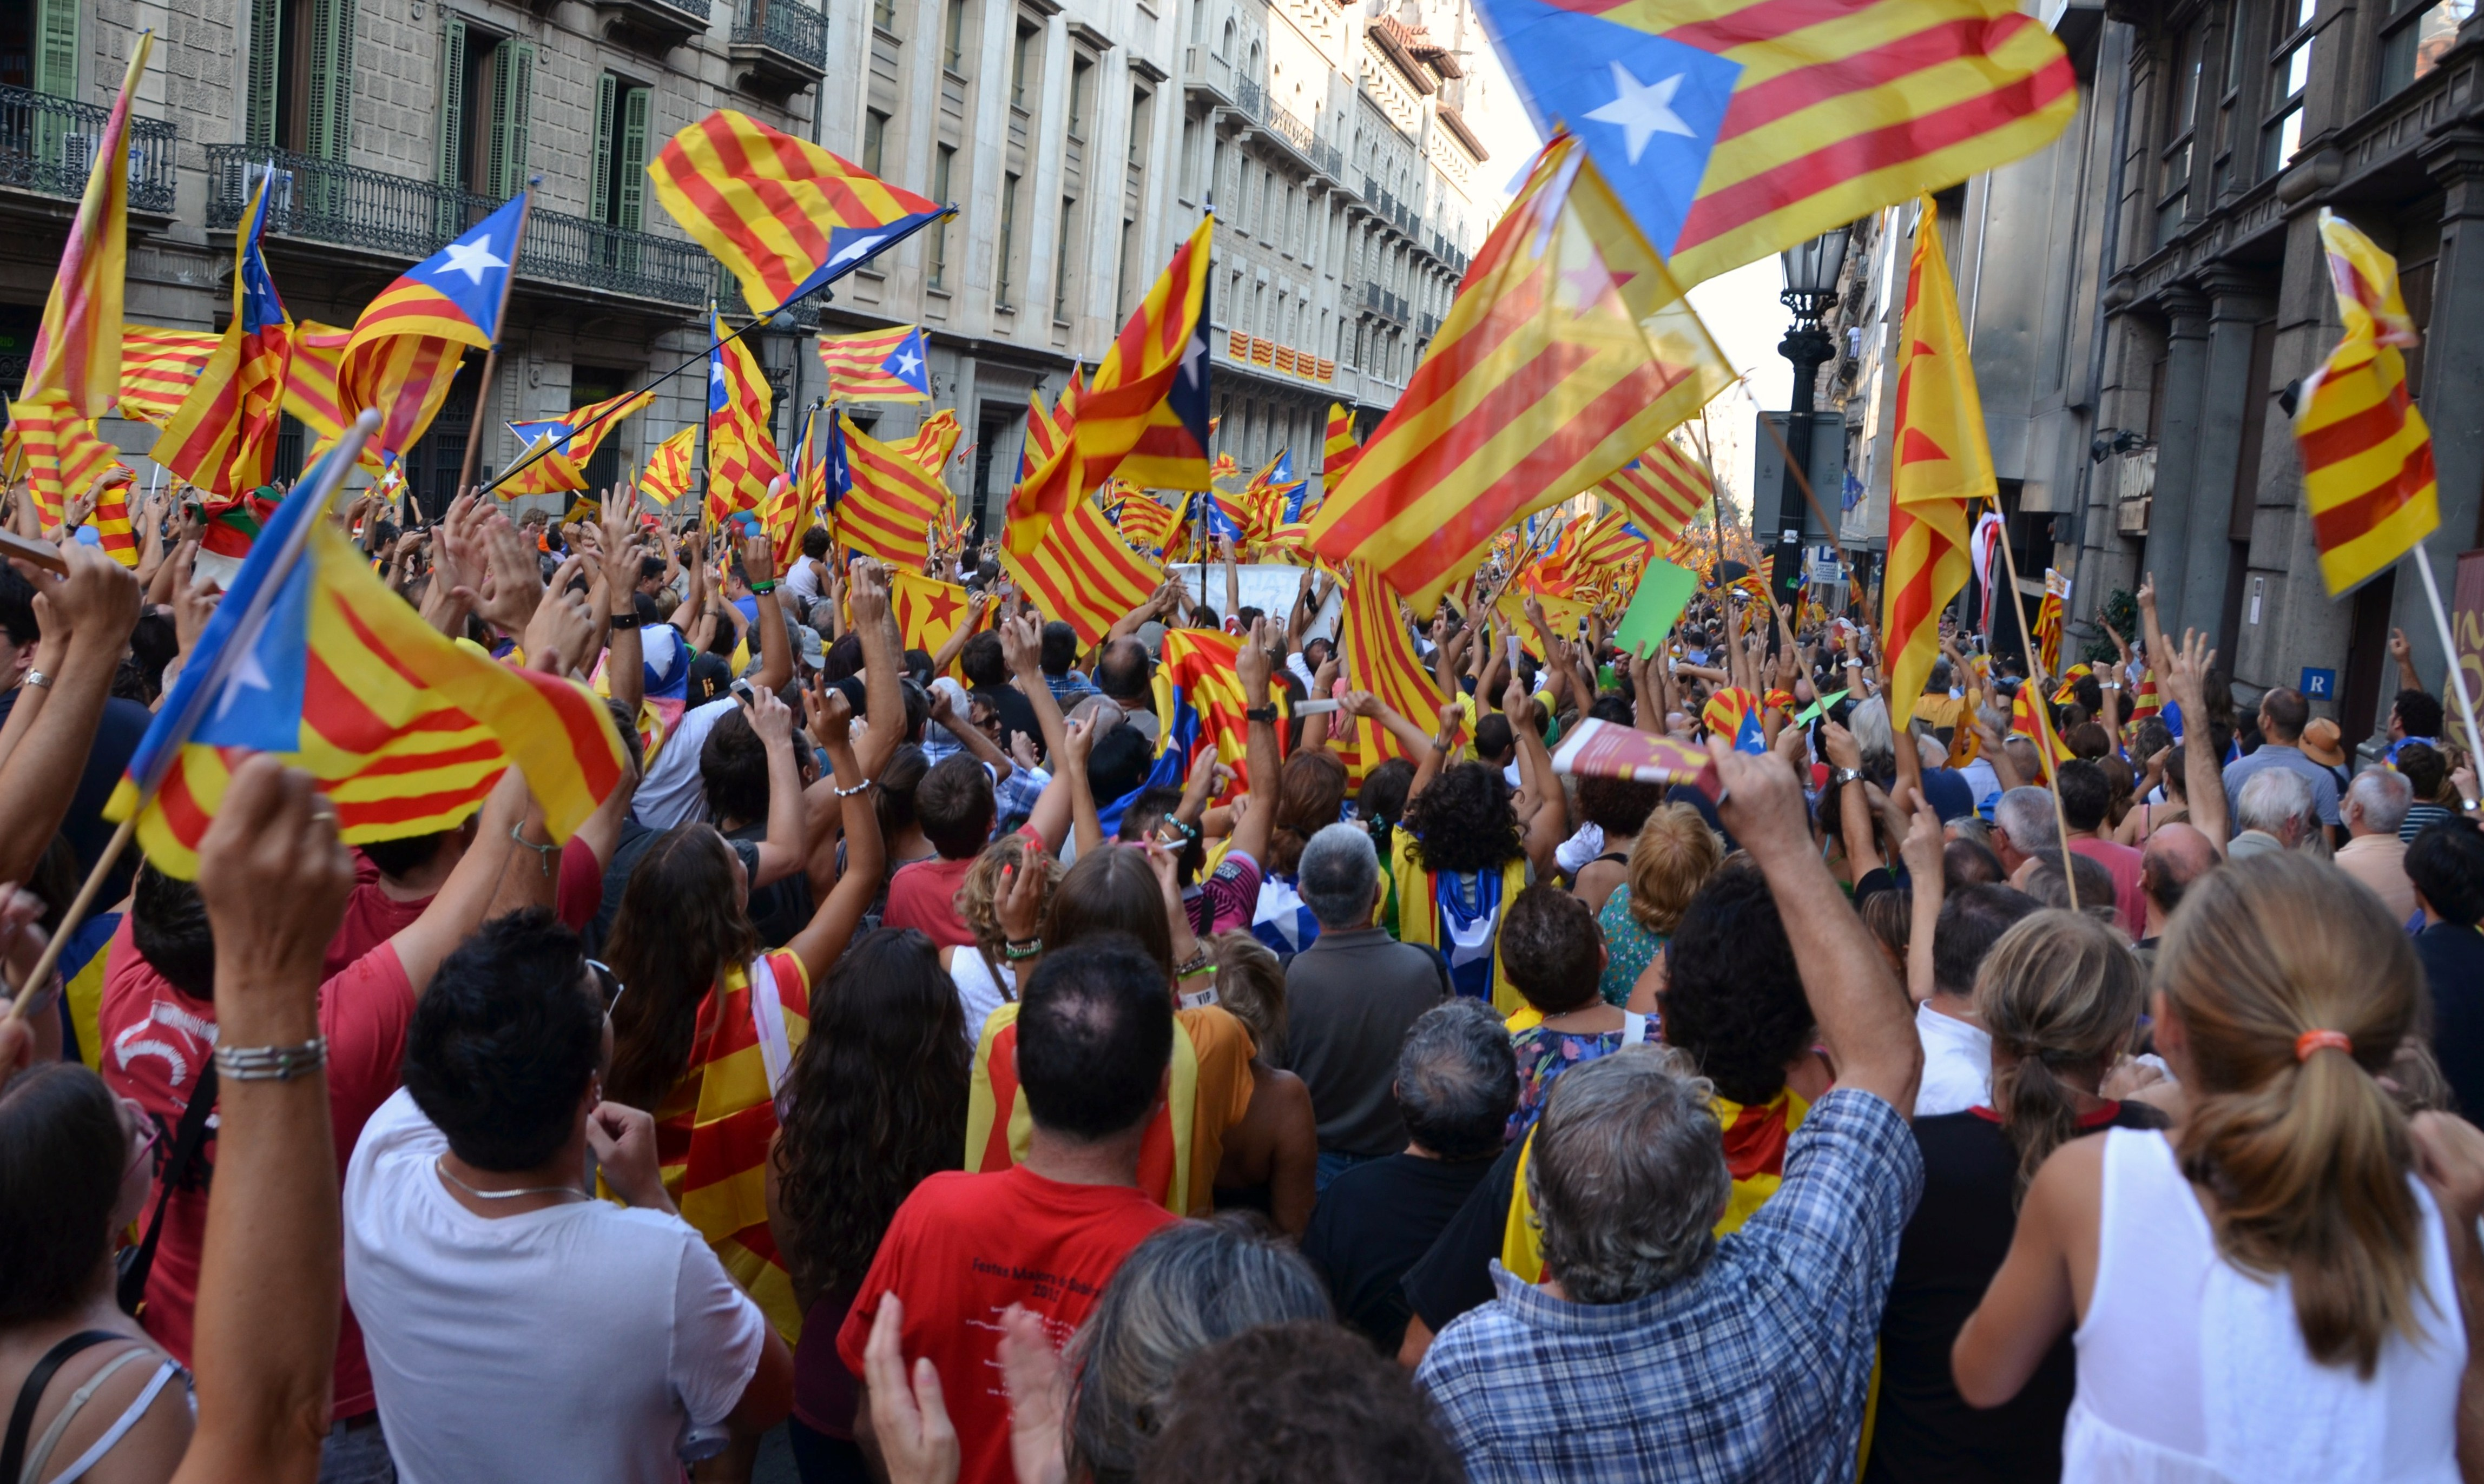 Josep Renalias - Lohen11